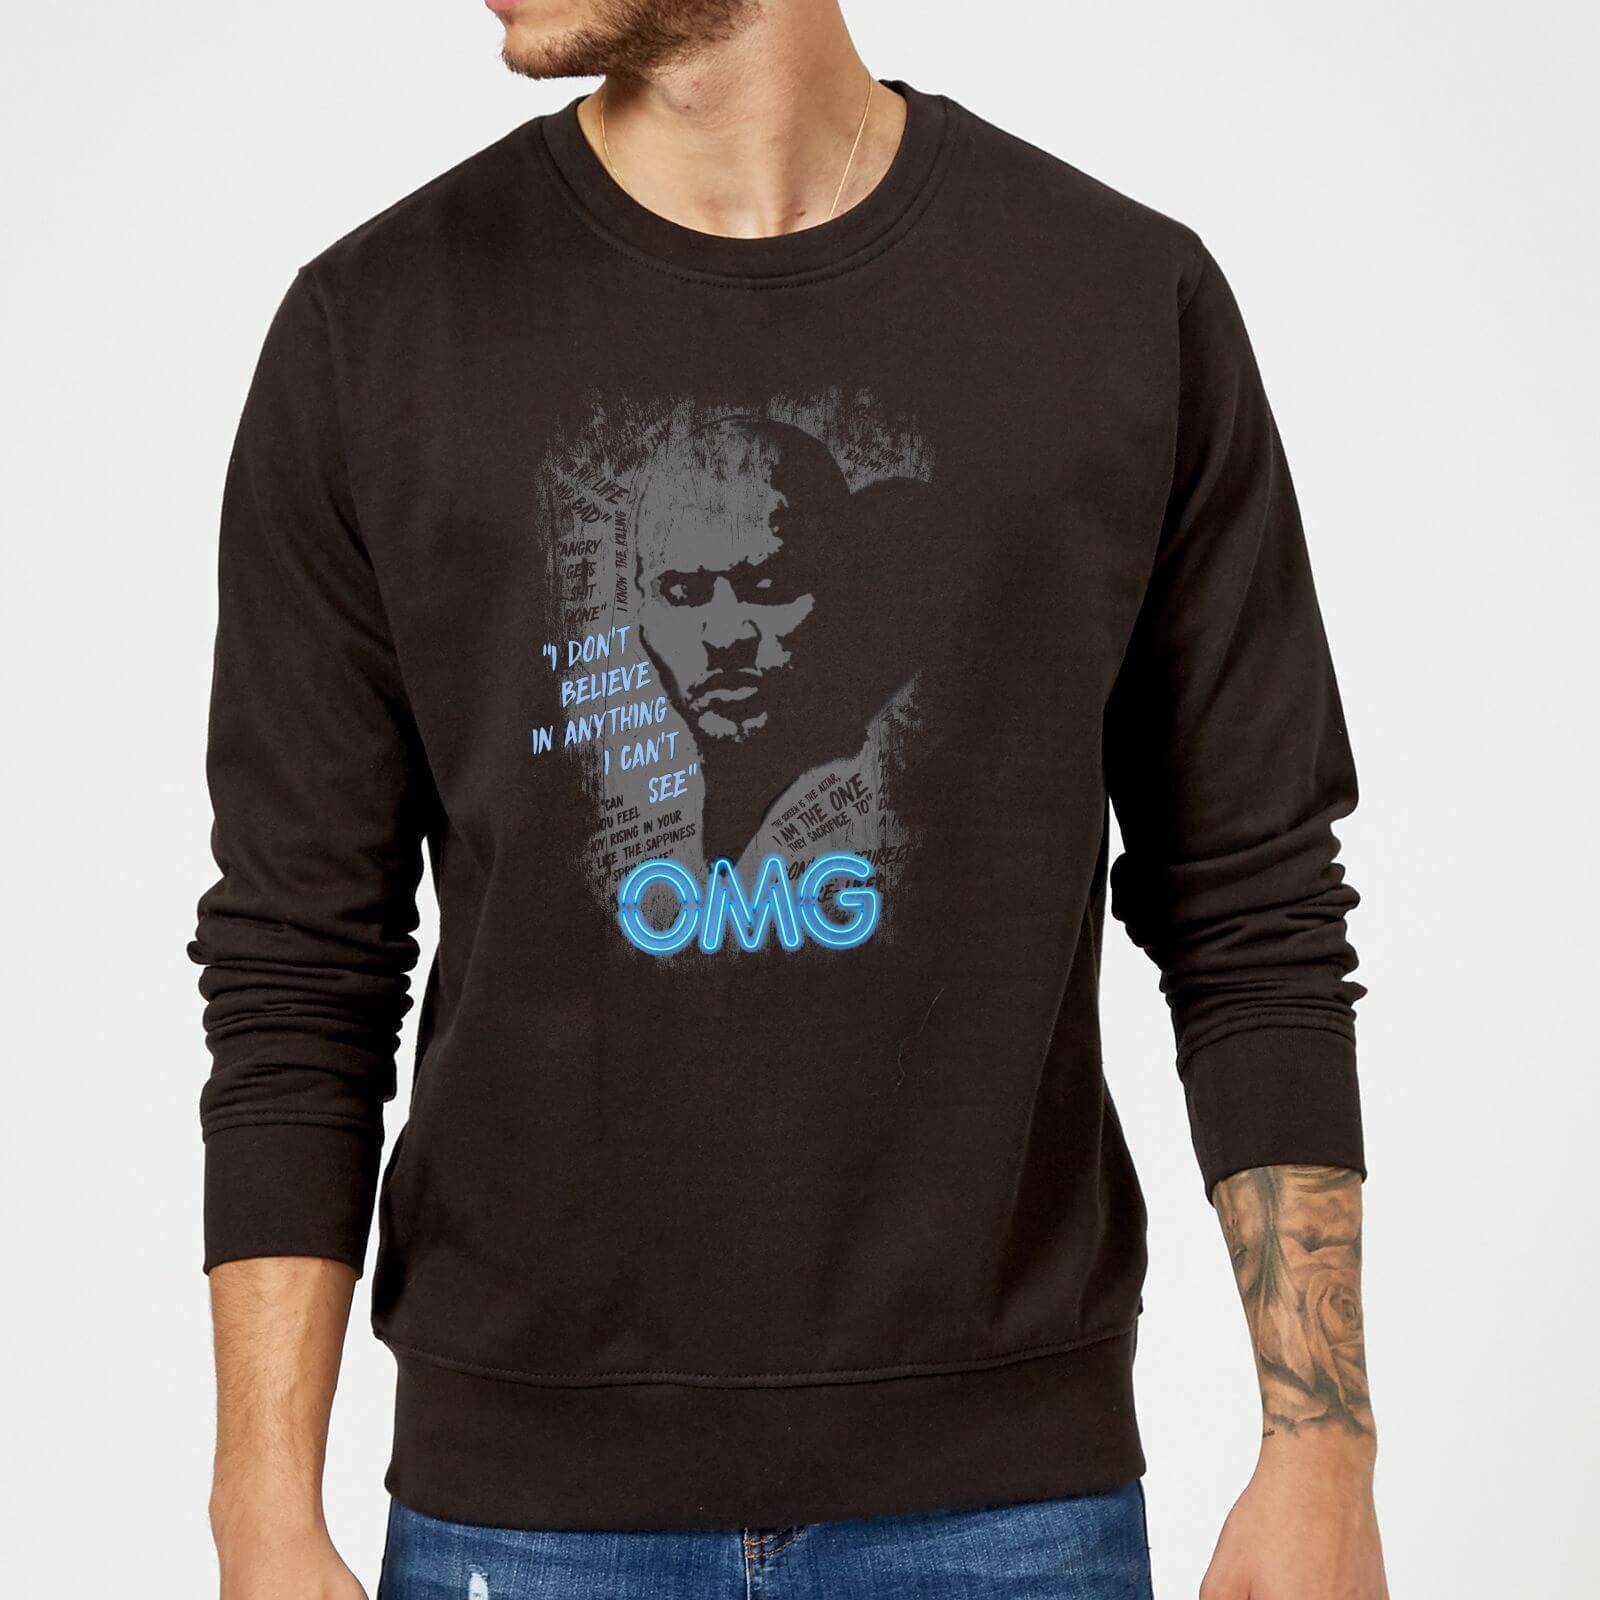 American Gods Shadow OMG Sweatshirt - Black - S - Black-male